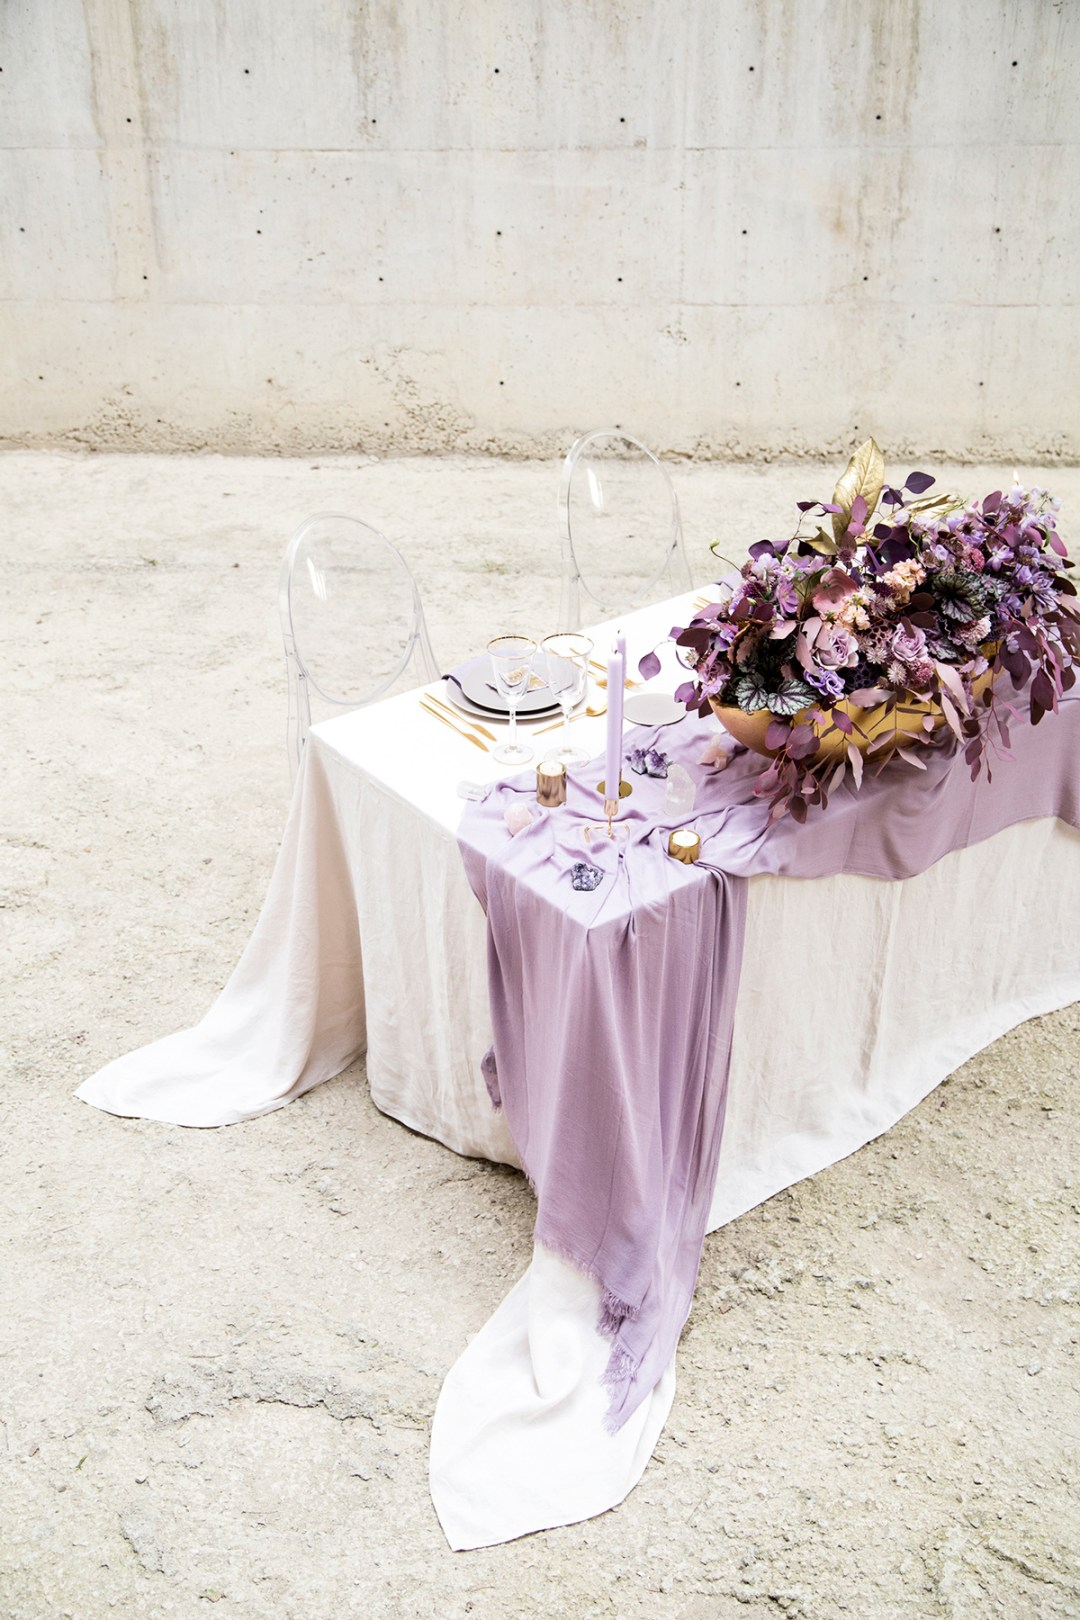 Lush-Amethyst-Wedding-Inspiration-4